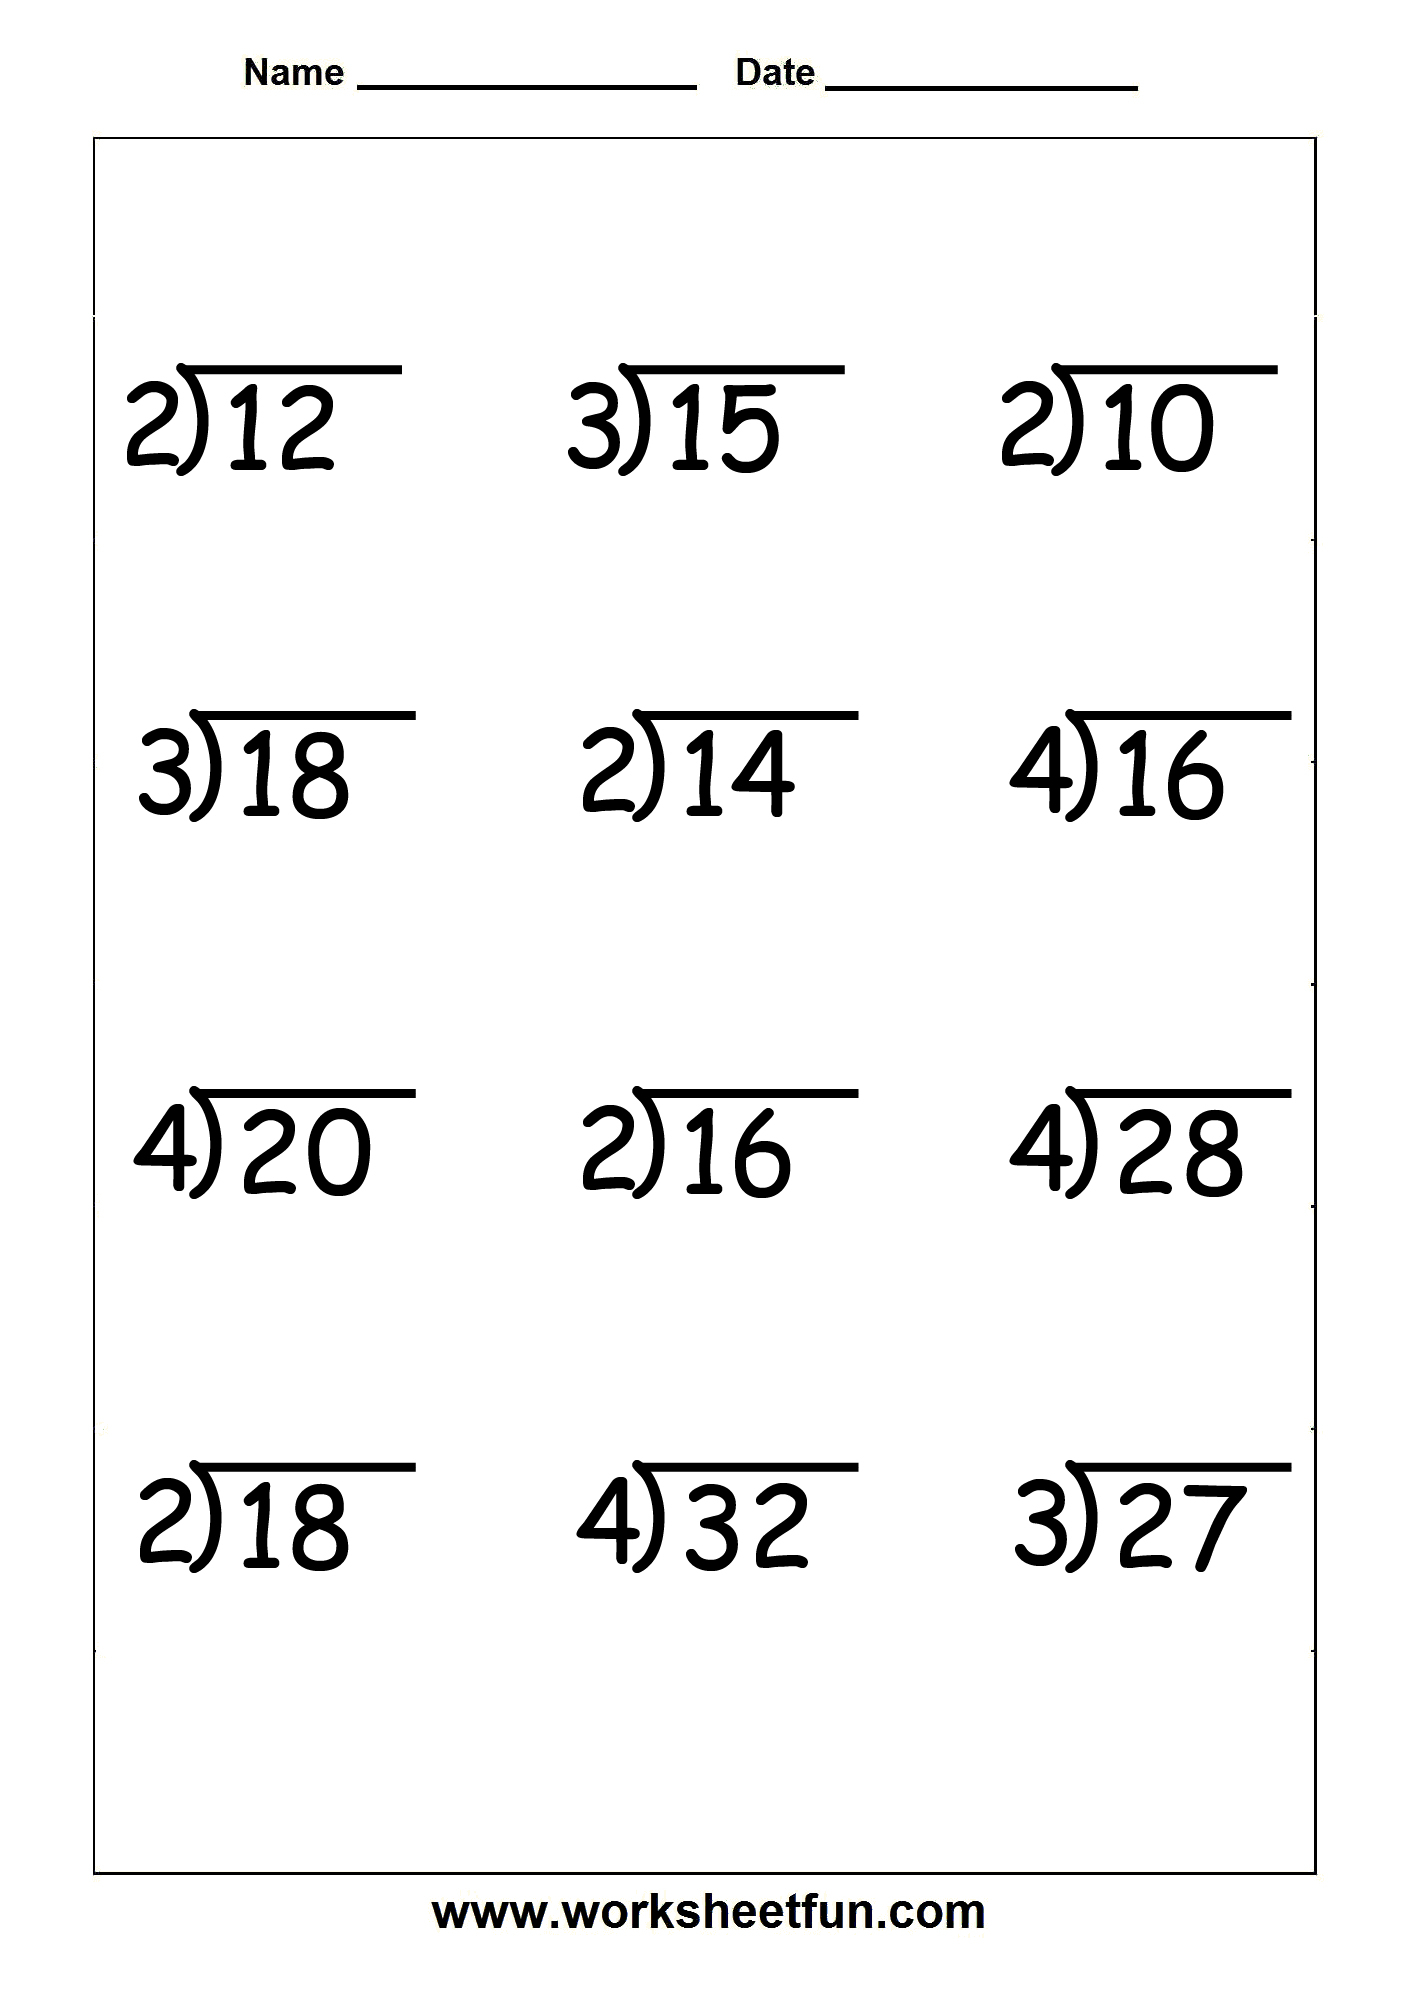 Grade 3Rd Worksheet Geometry New Free Math Worksheets For Fractions - Free Printable 3Rd Grade Worksheets